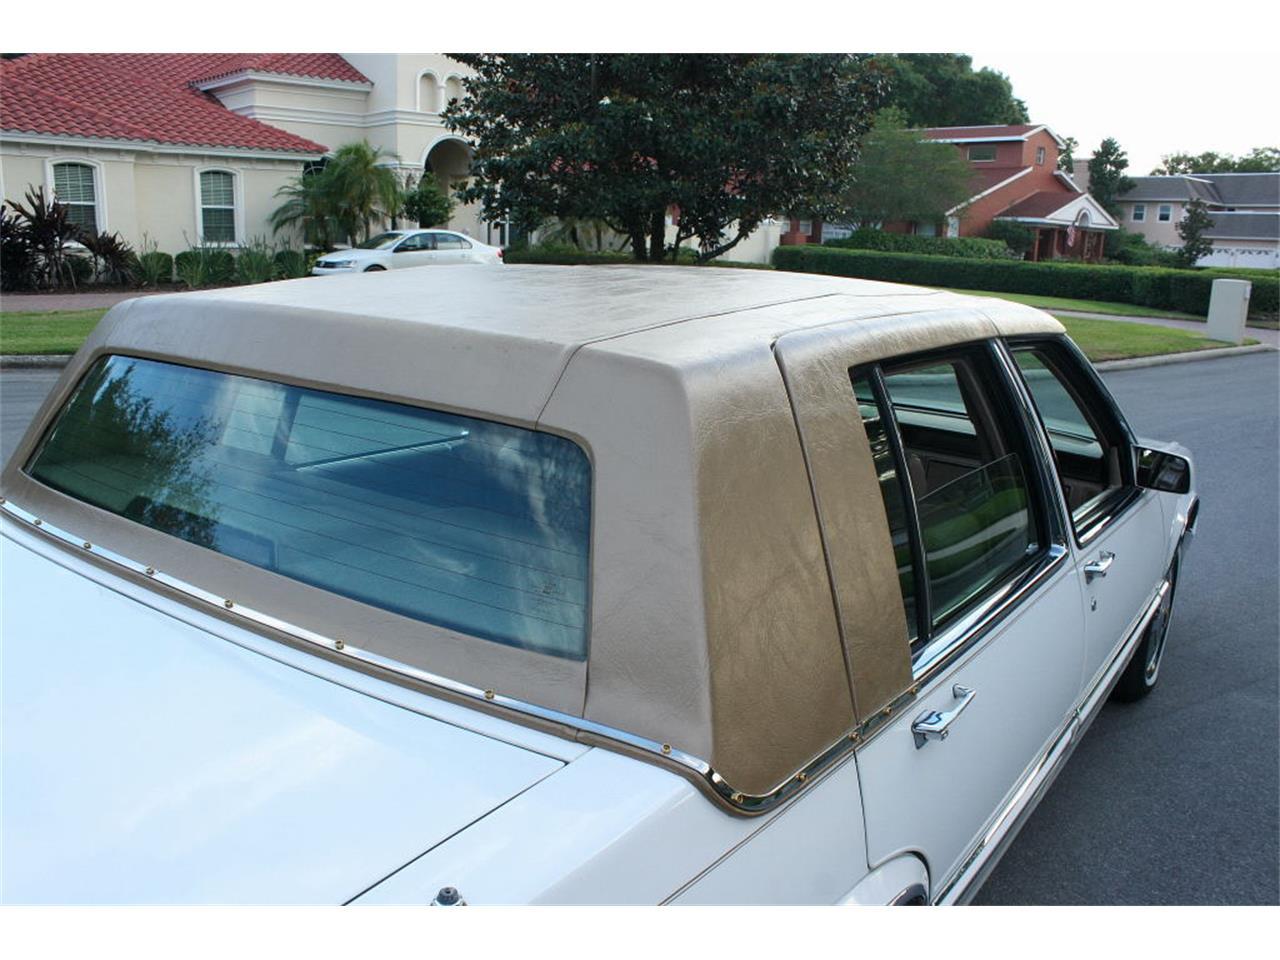 Large Picture of '91 Sedan located in Lakeland Florida - $9,500.00 - L5XM